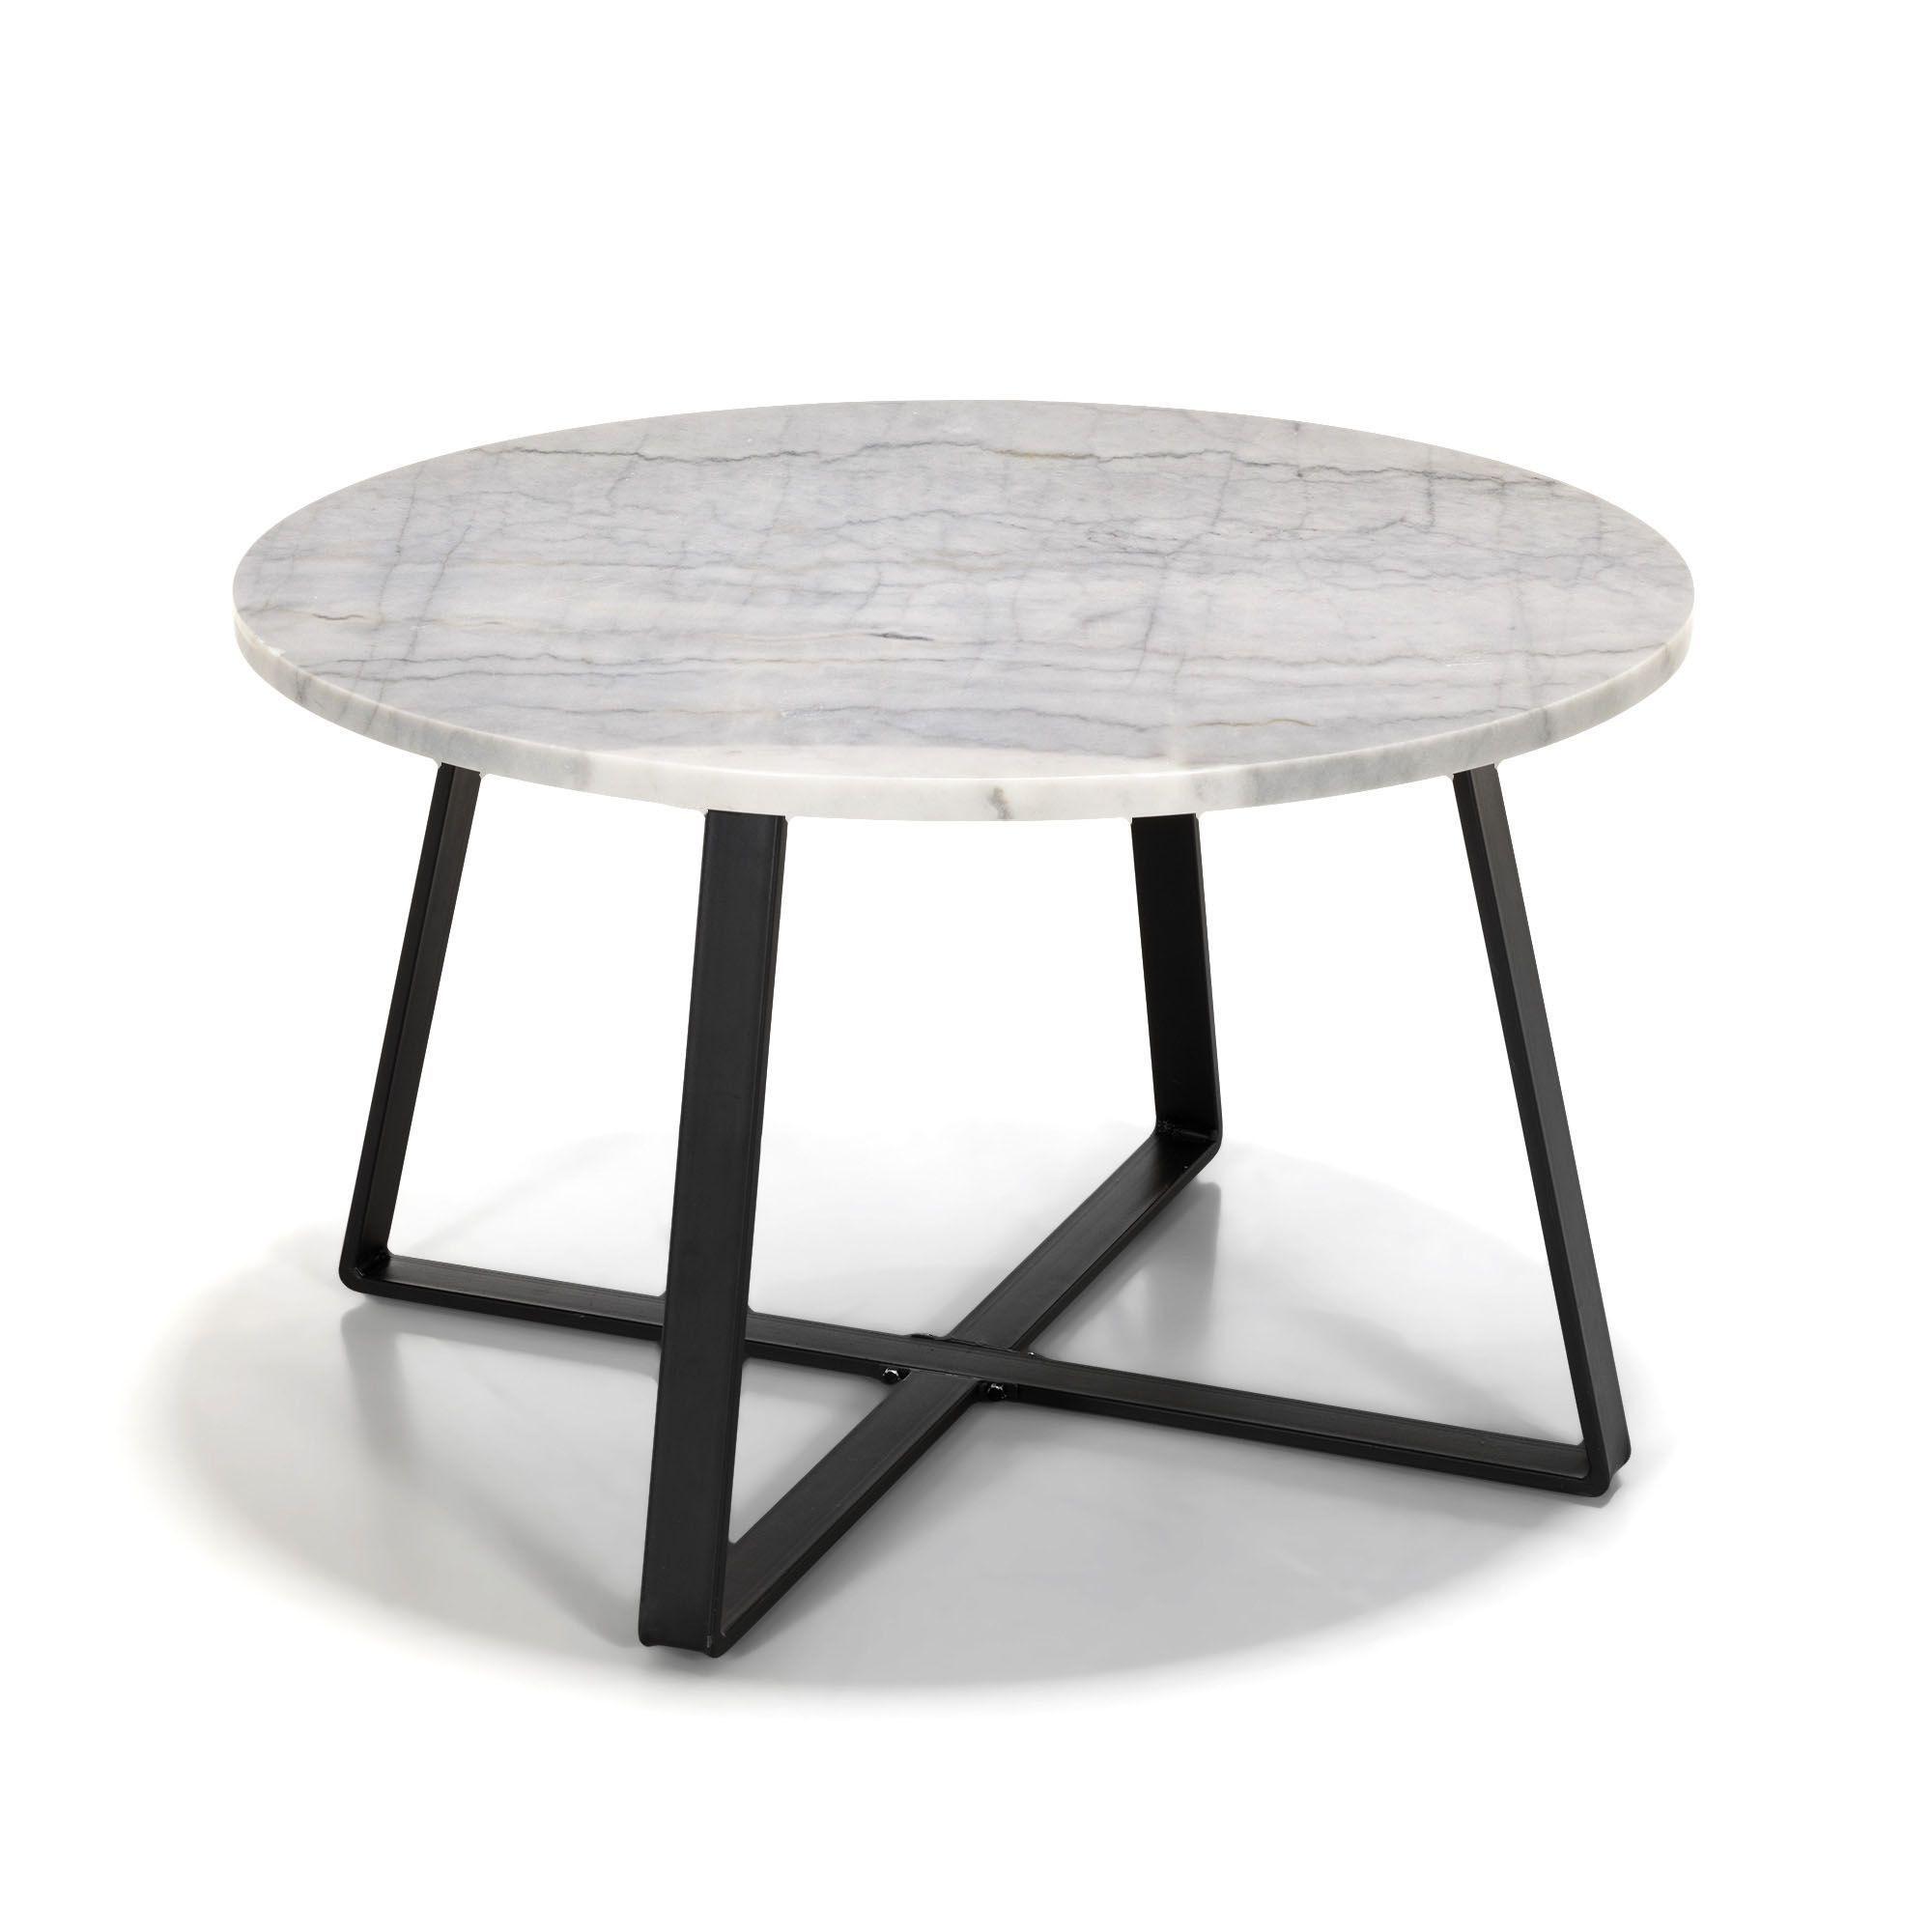 Table basse galet marbre